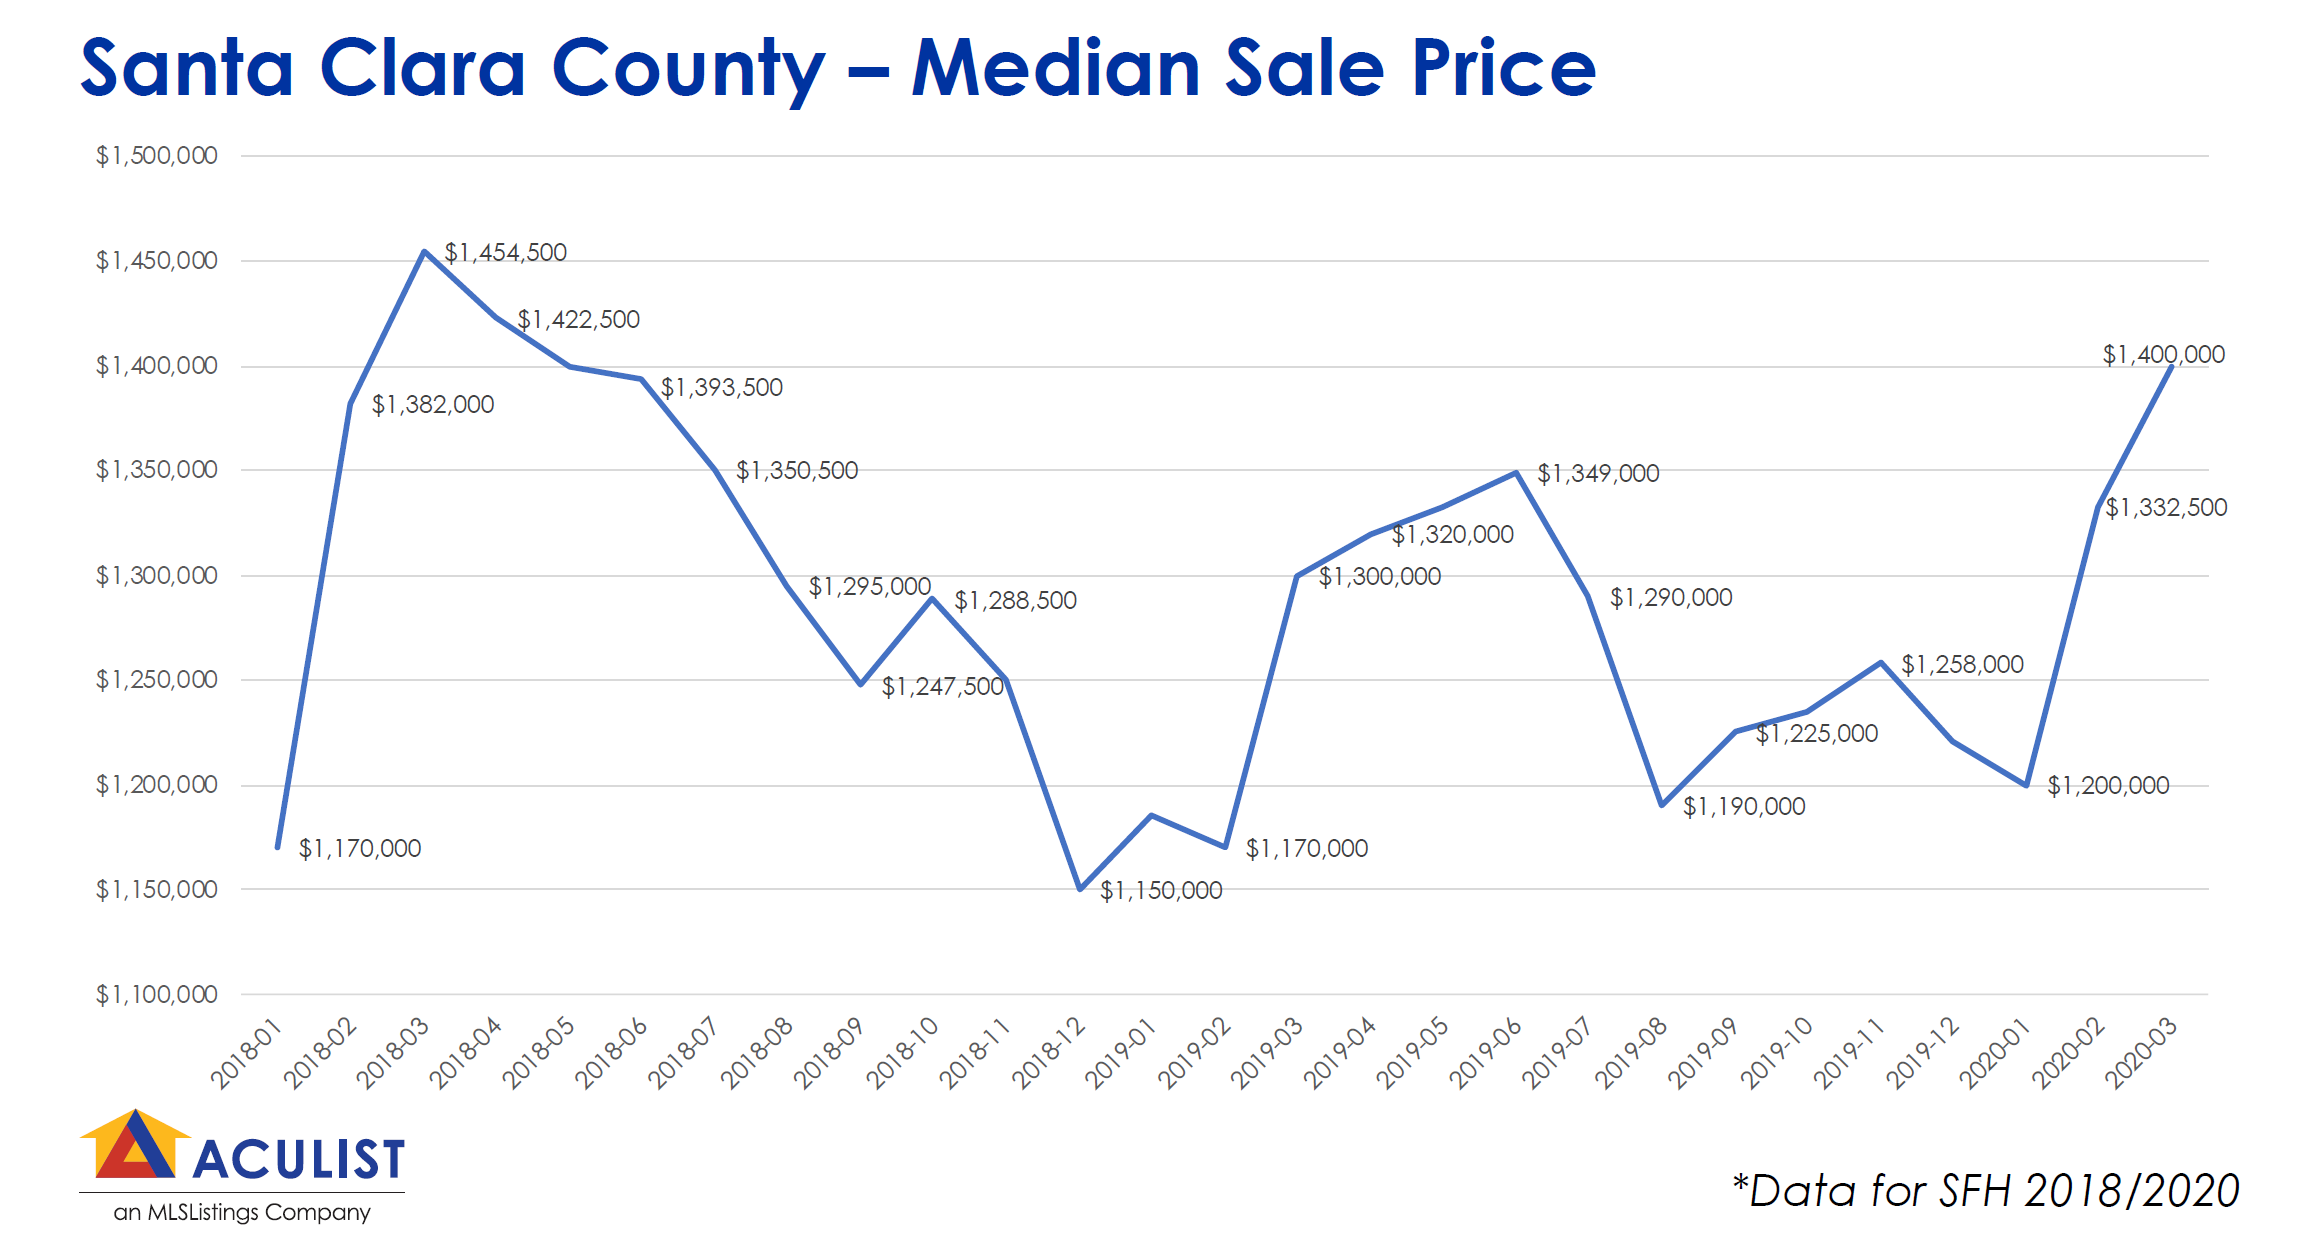 median_sales_price_trend